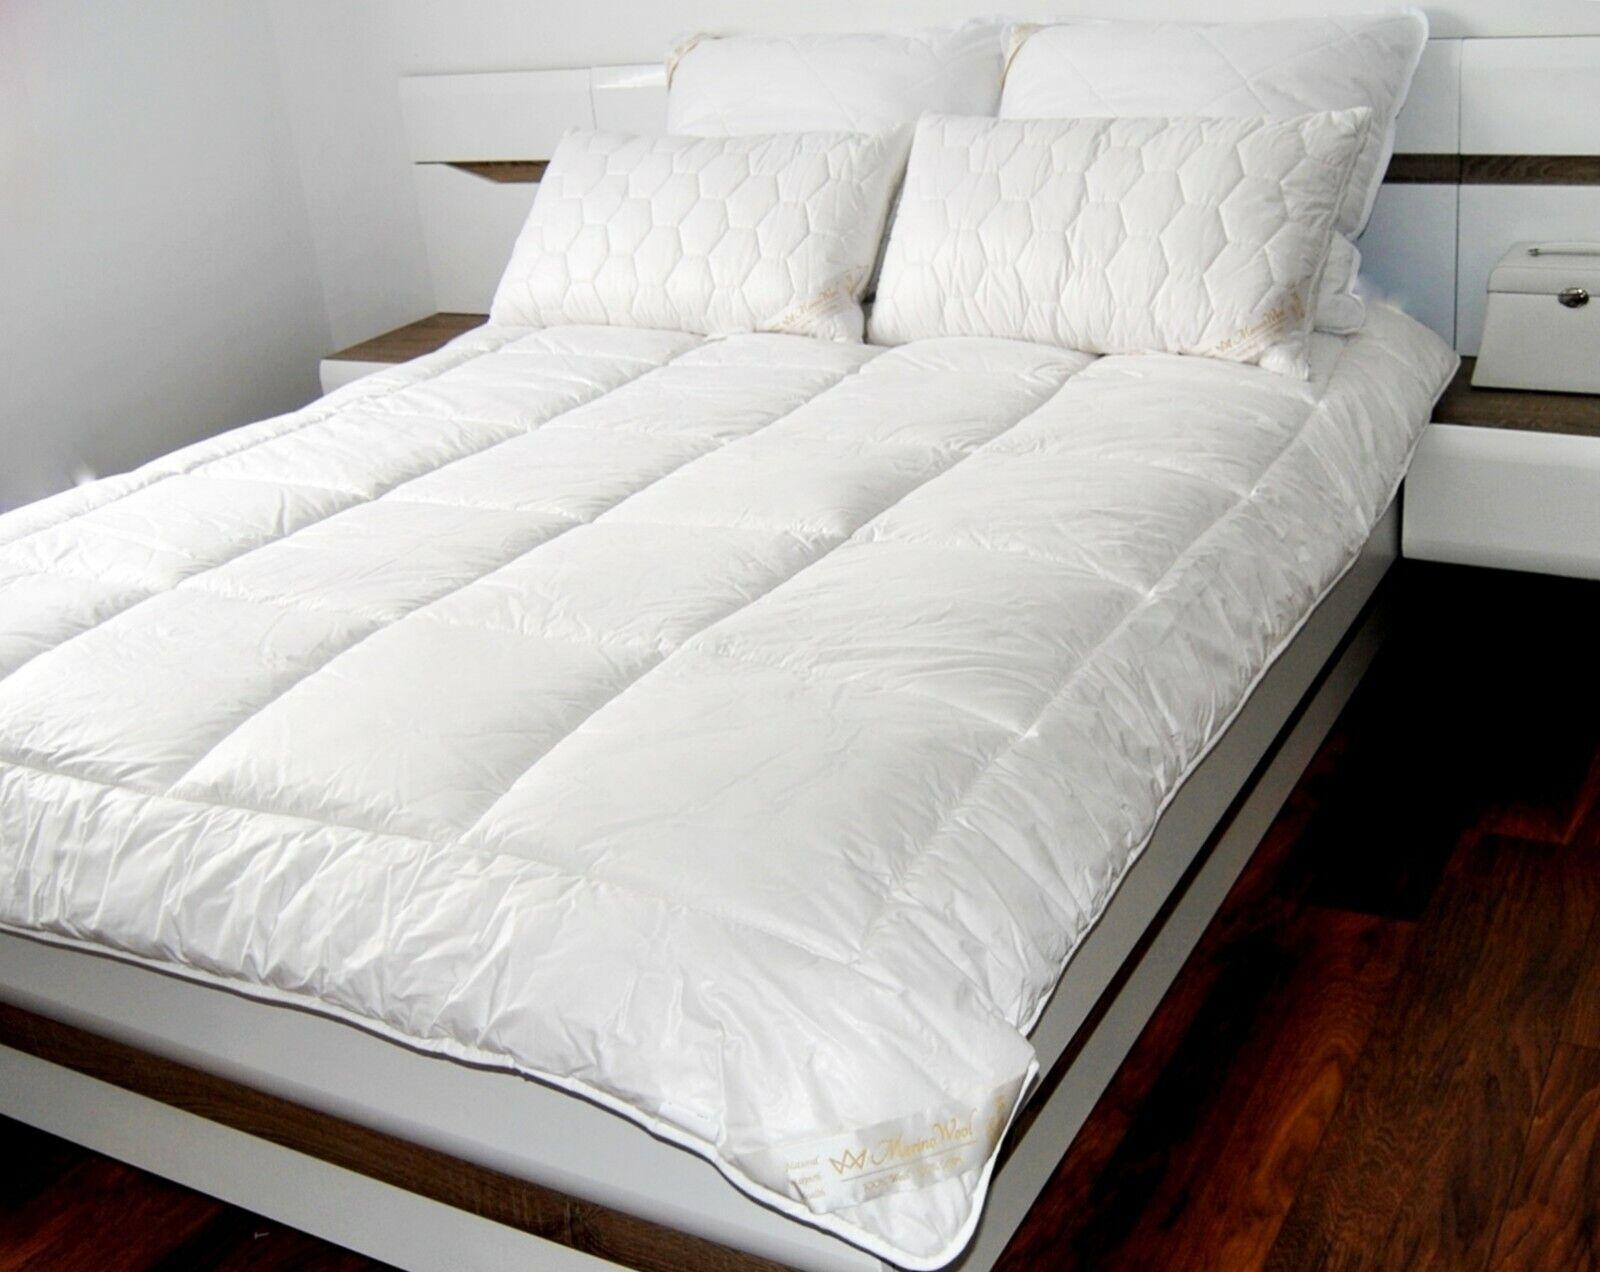 100% Merino Wool Bettdecke 8-10.5tog King Größe 220 x 230cm + 2 Kissen 45 x 75